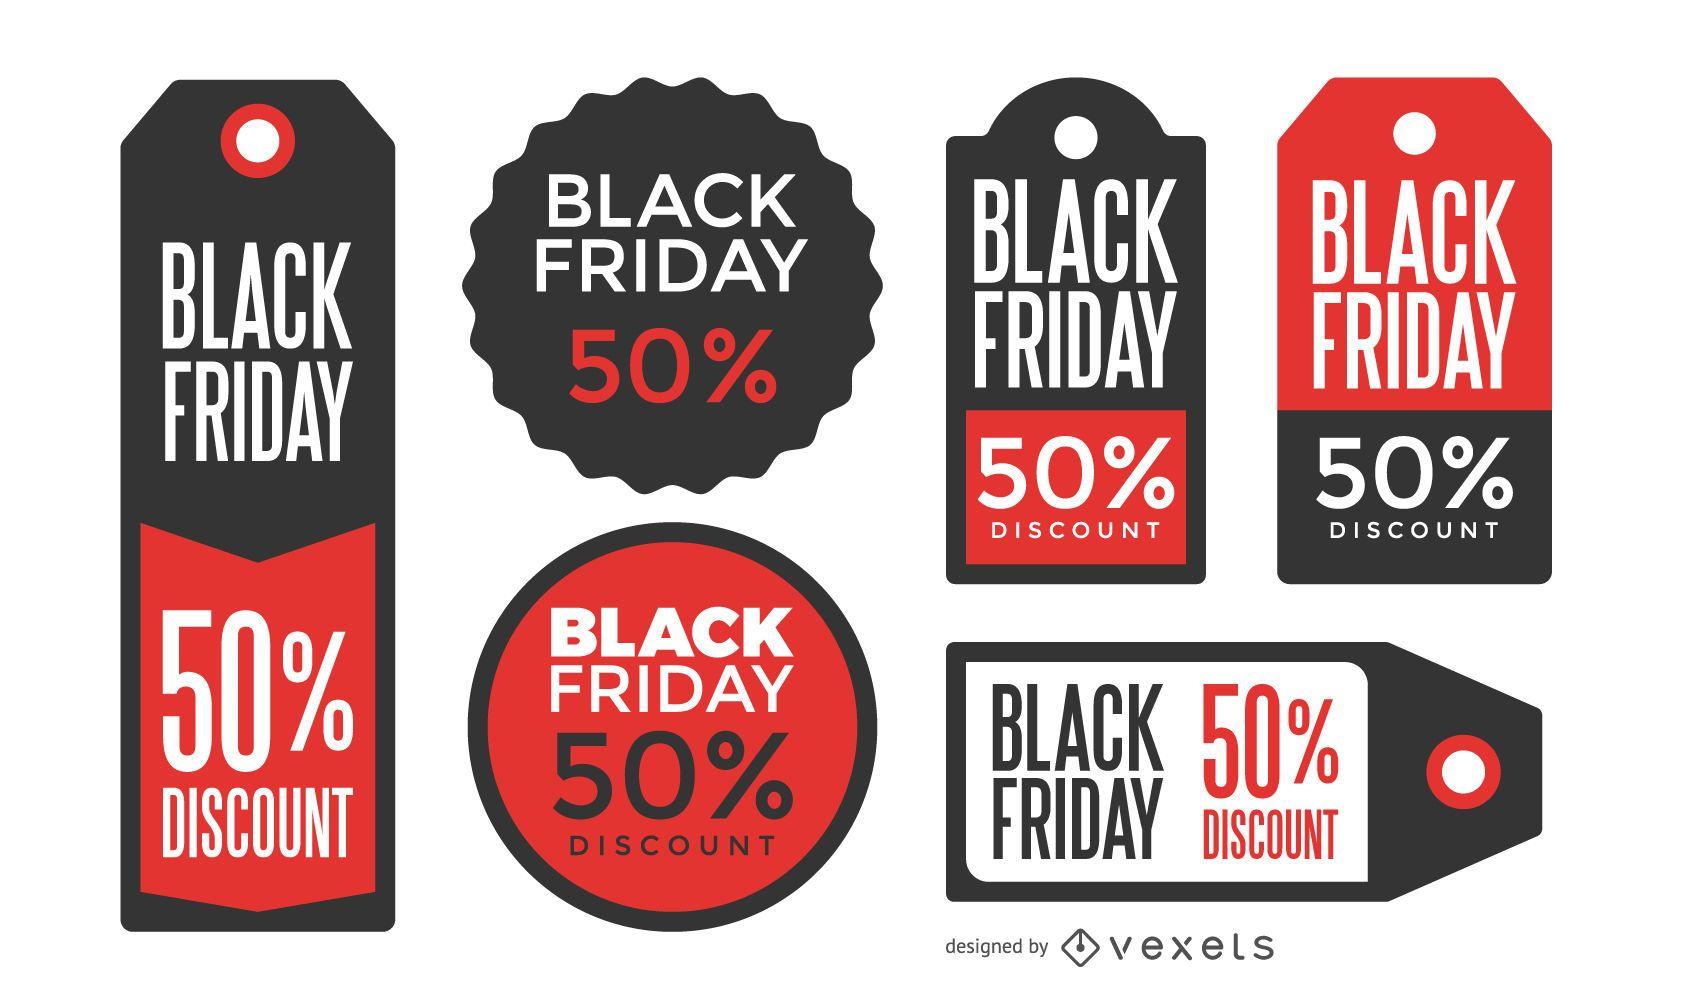 Black Friday price tags